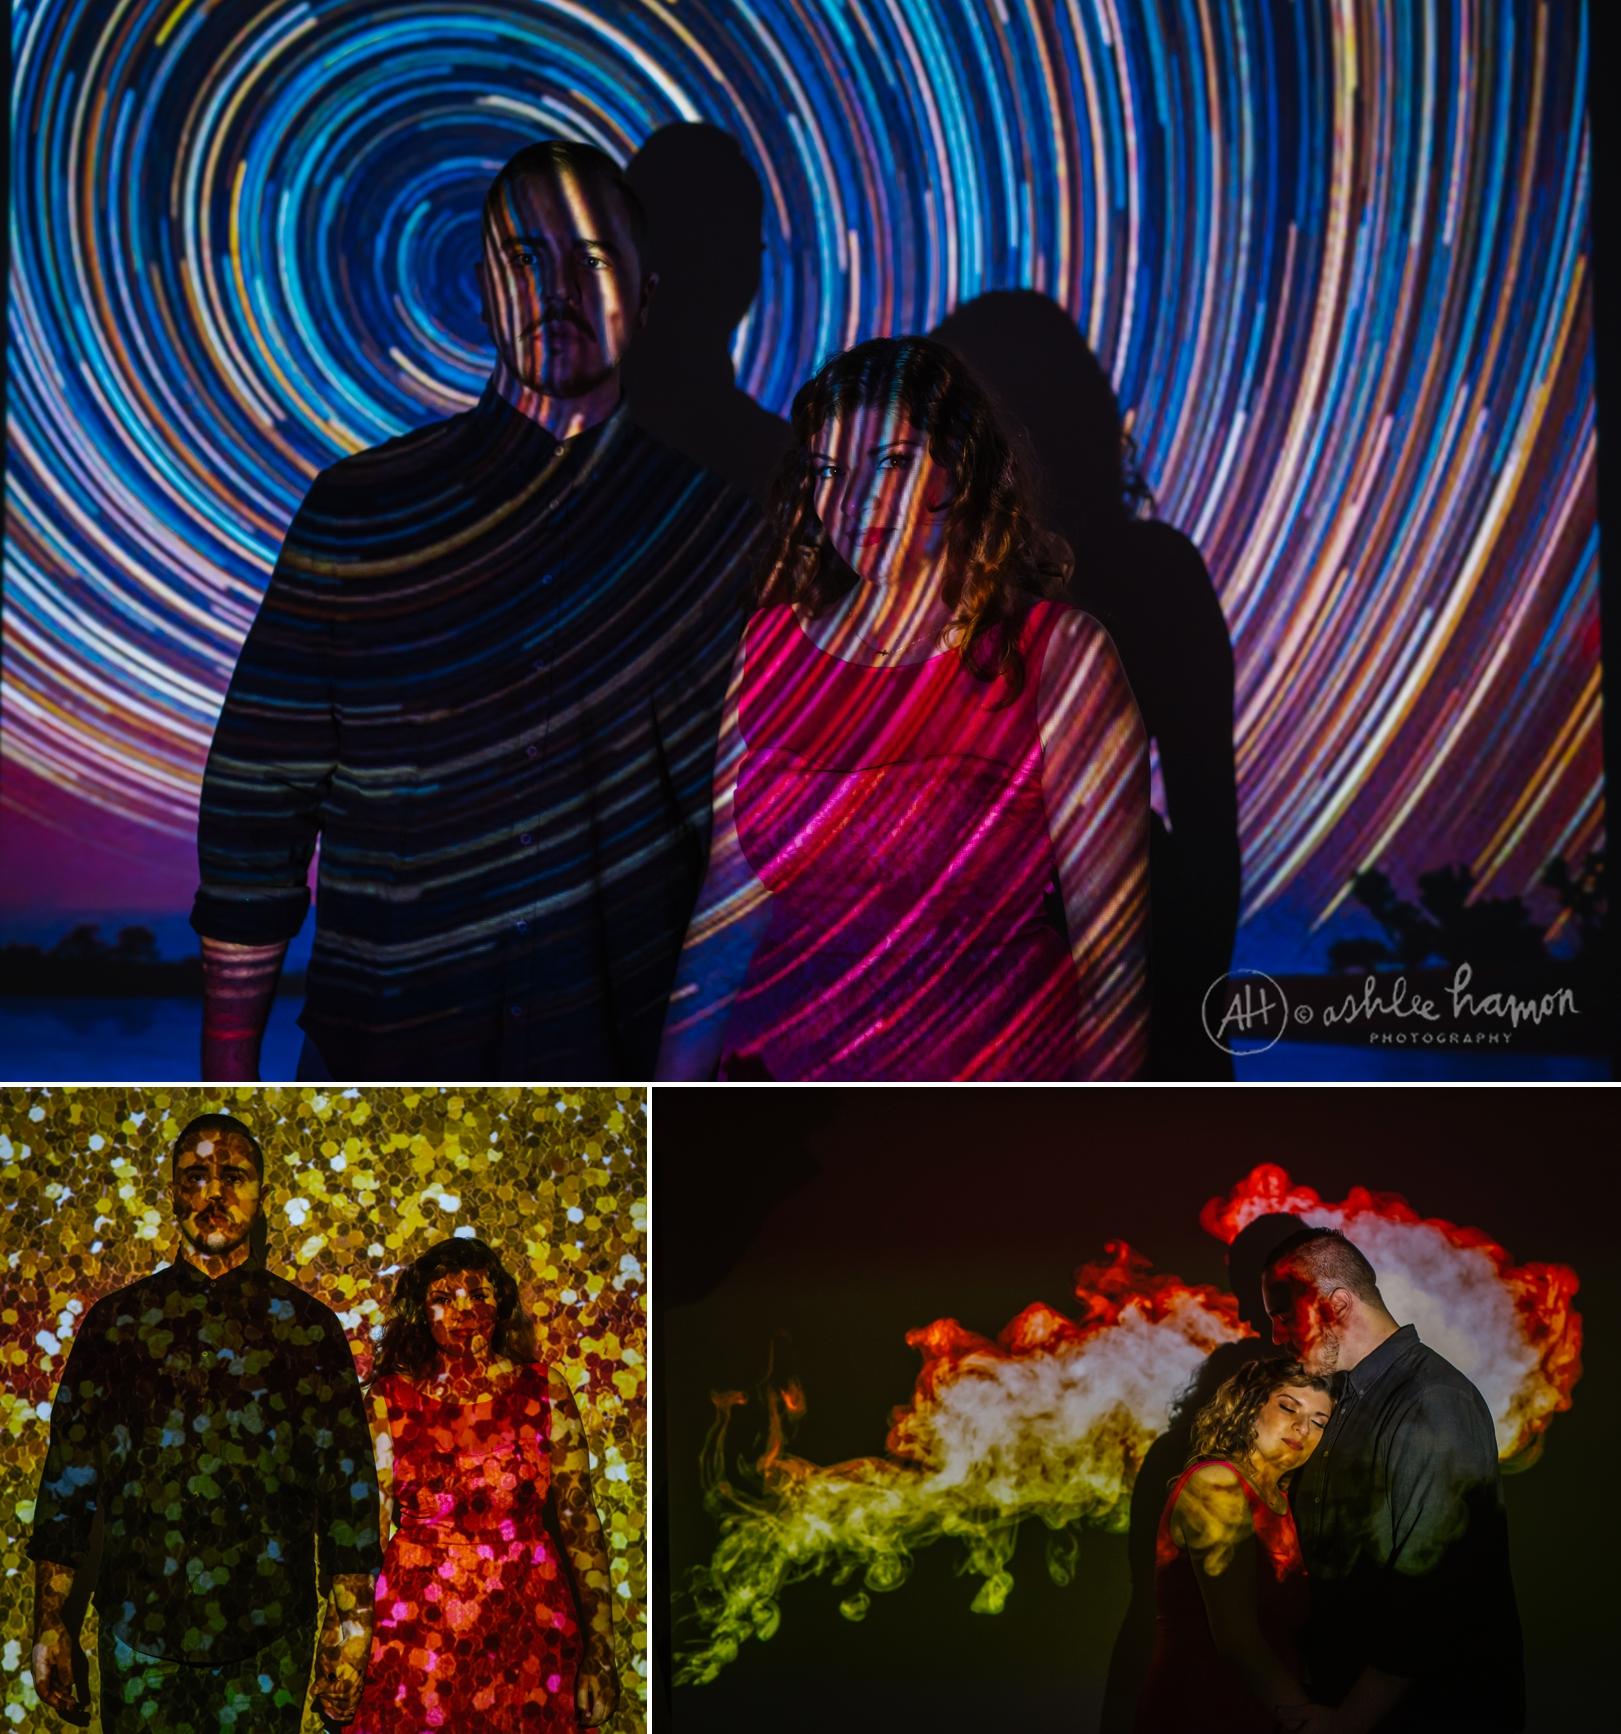 ashlee-hamon-wedding-photography-tampa-urban-cafe-engagement_0010.jpg